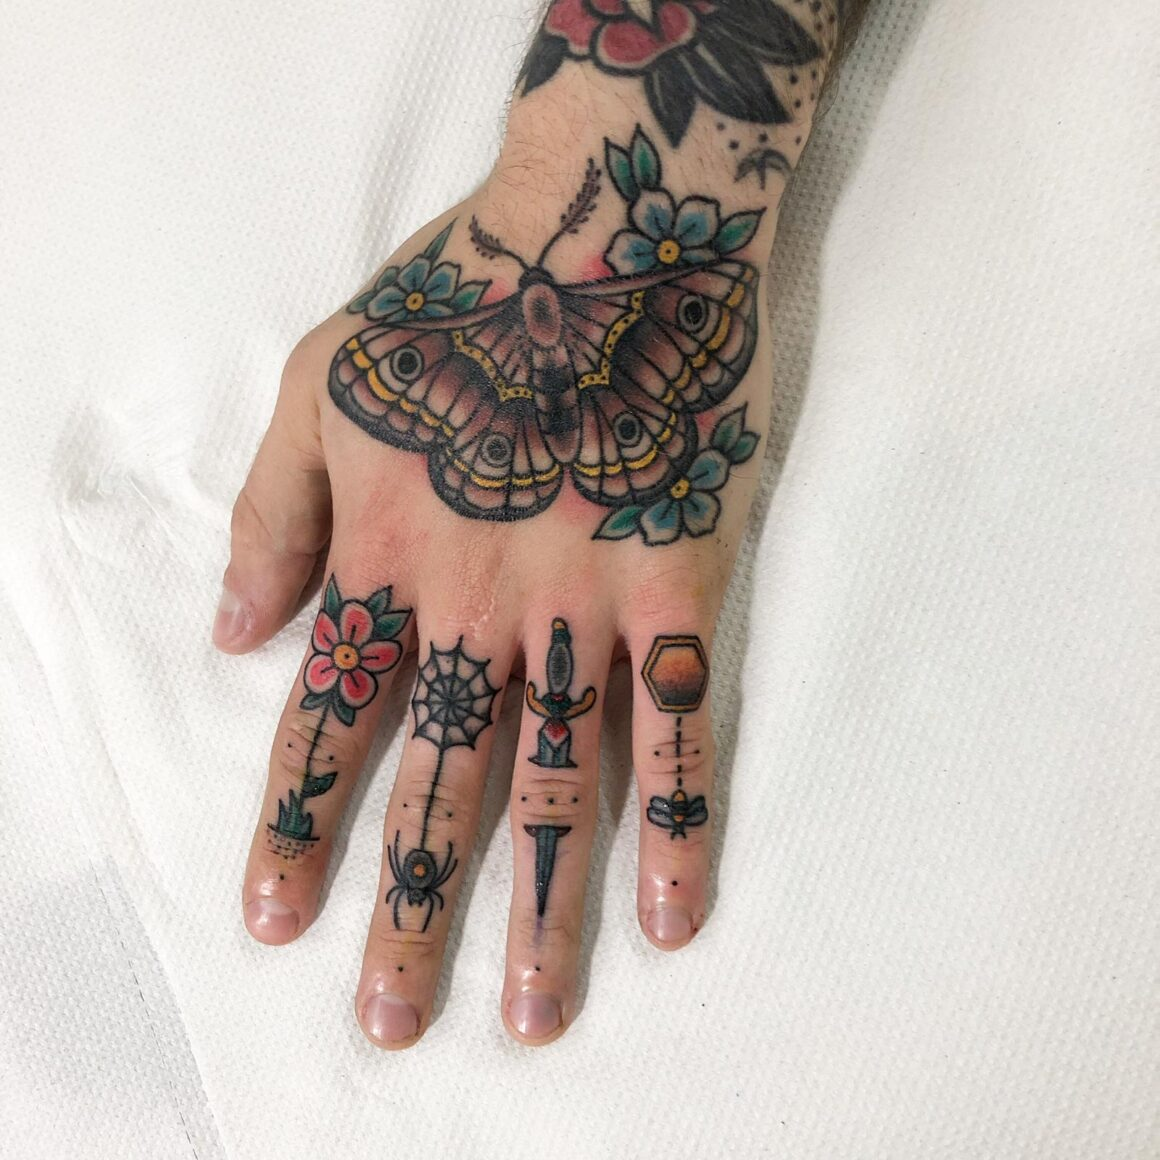 Thomas, Circle of Swords Tattoo Studio, Worcester (UK)